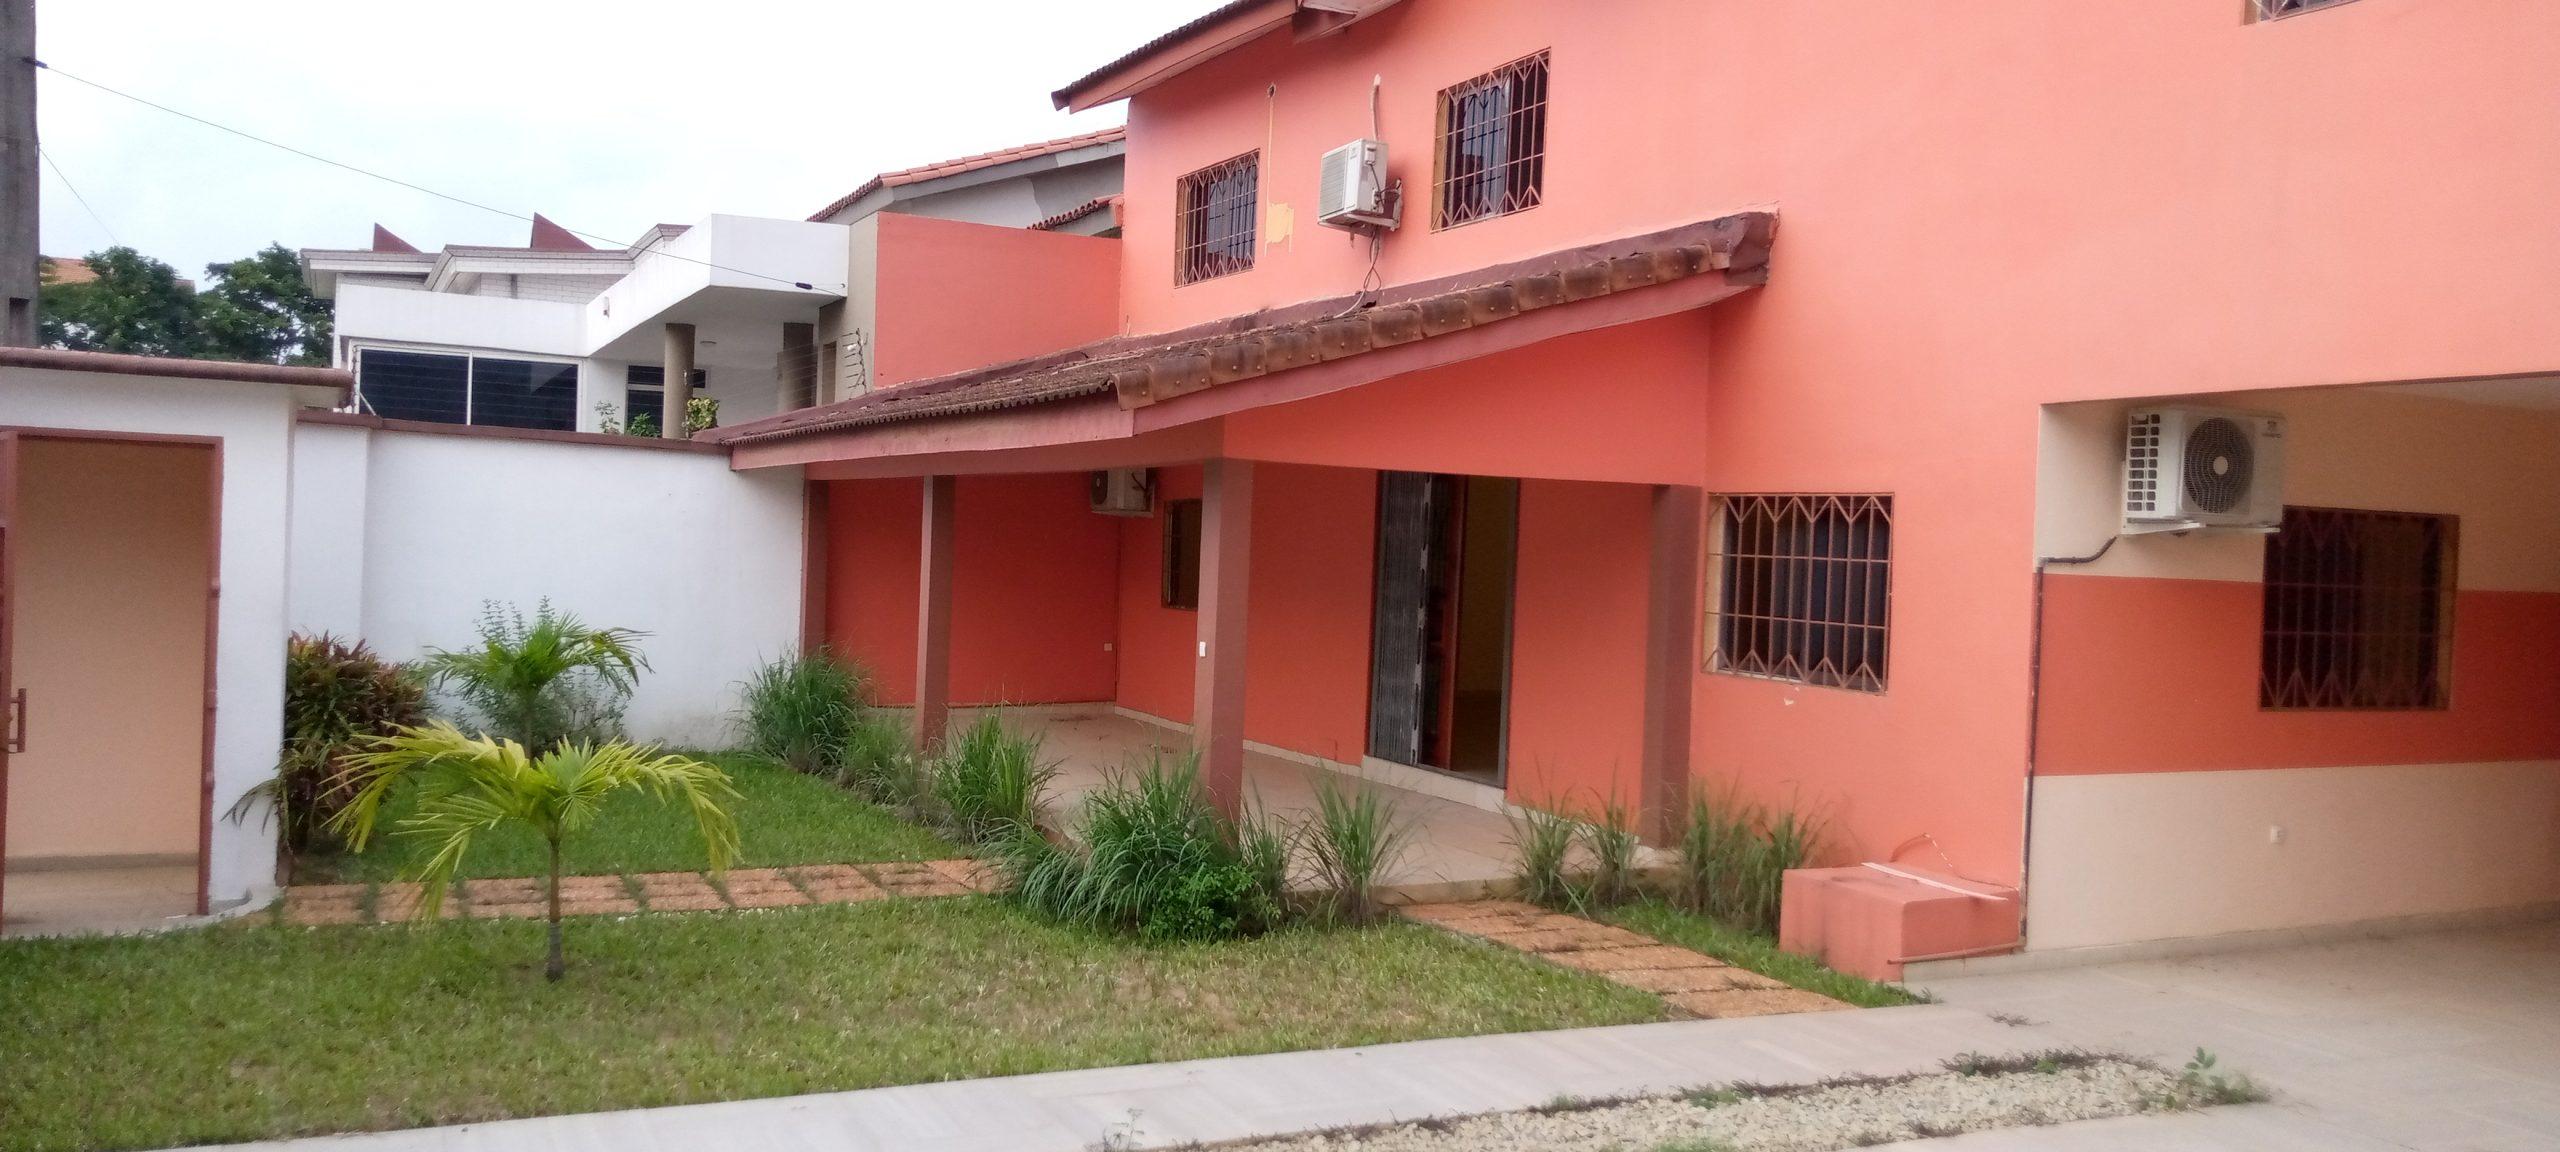 Maison à louer Rivera sinacaci1